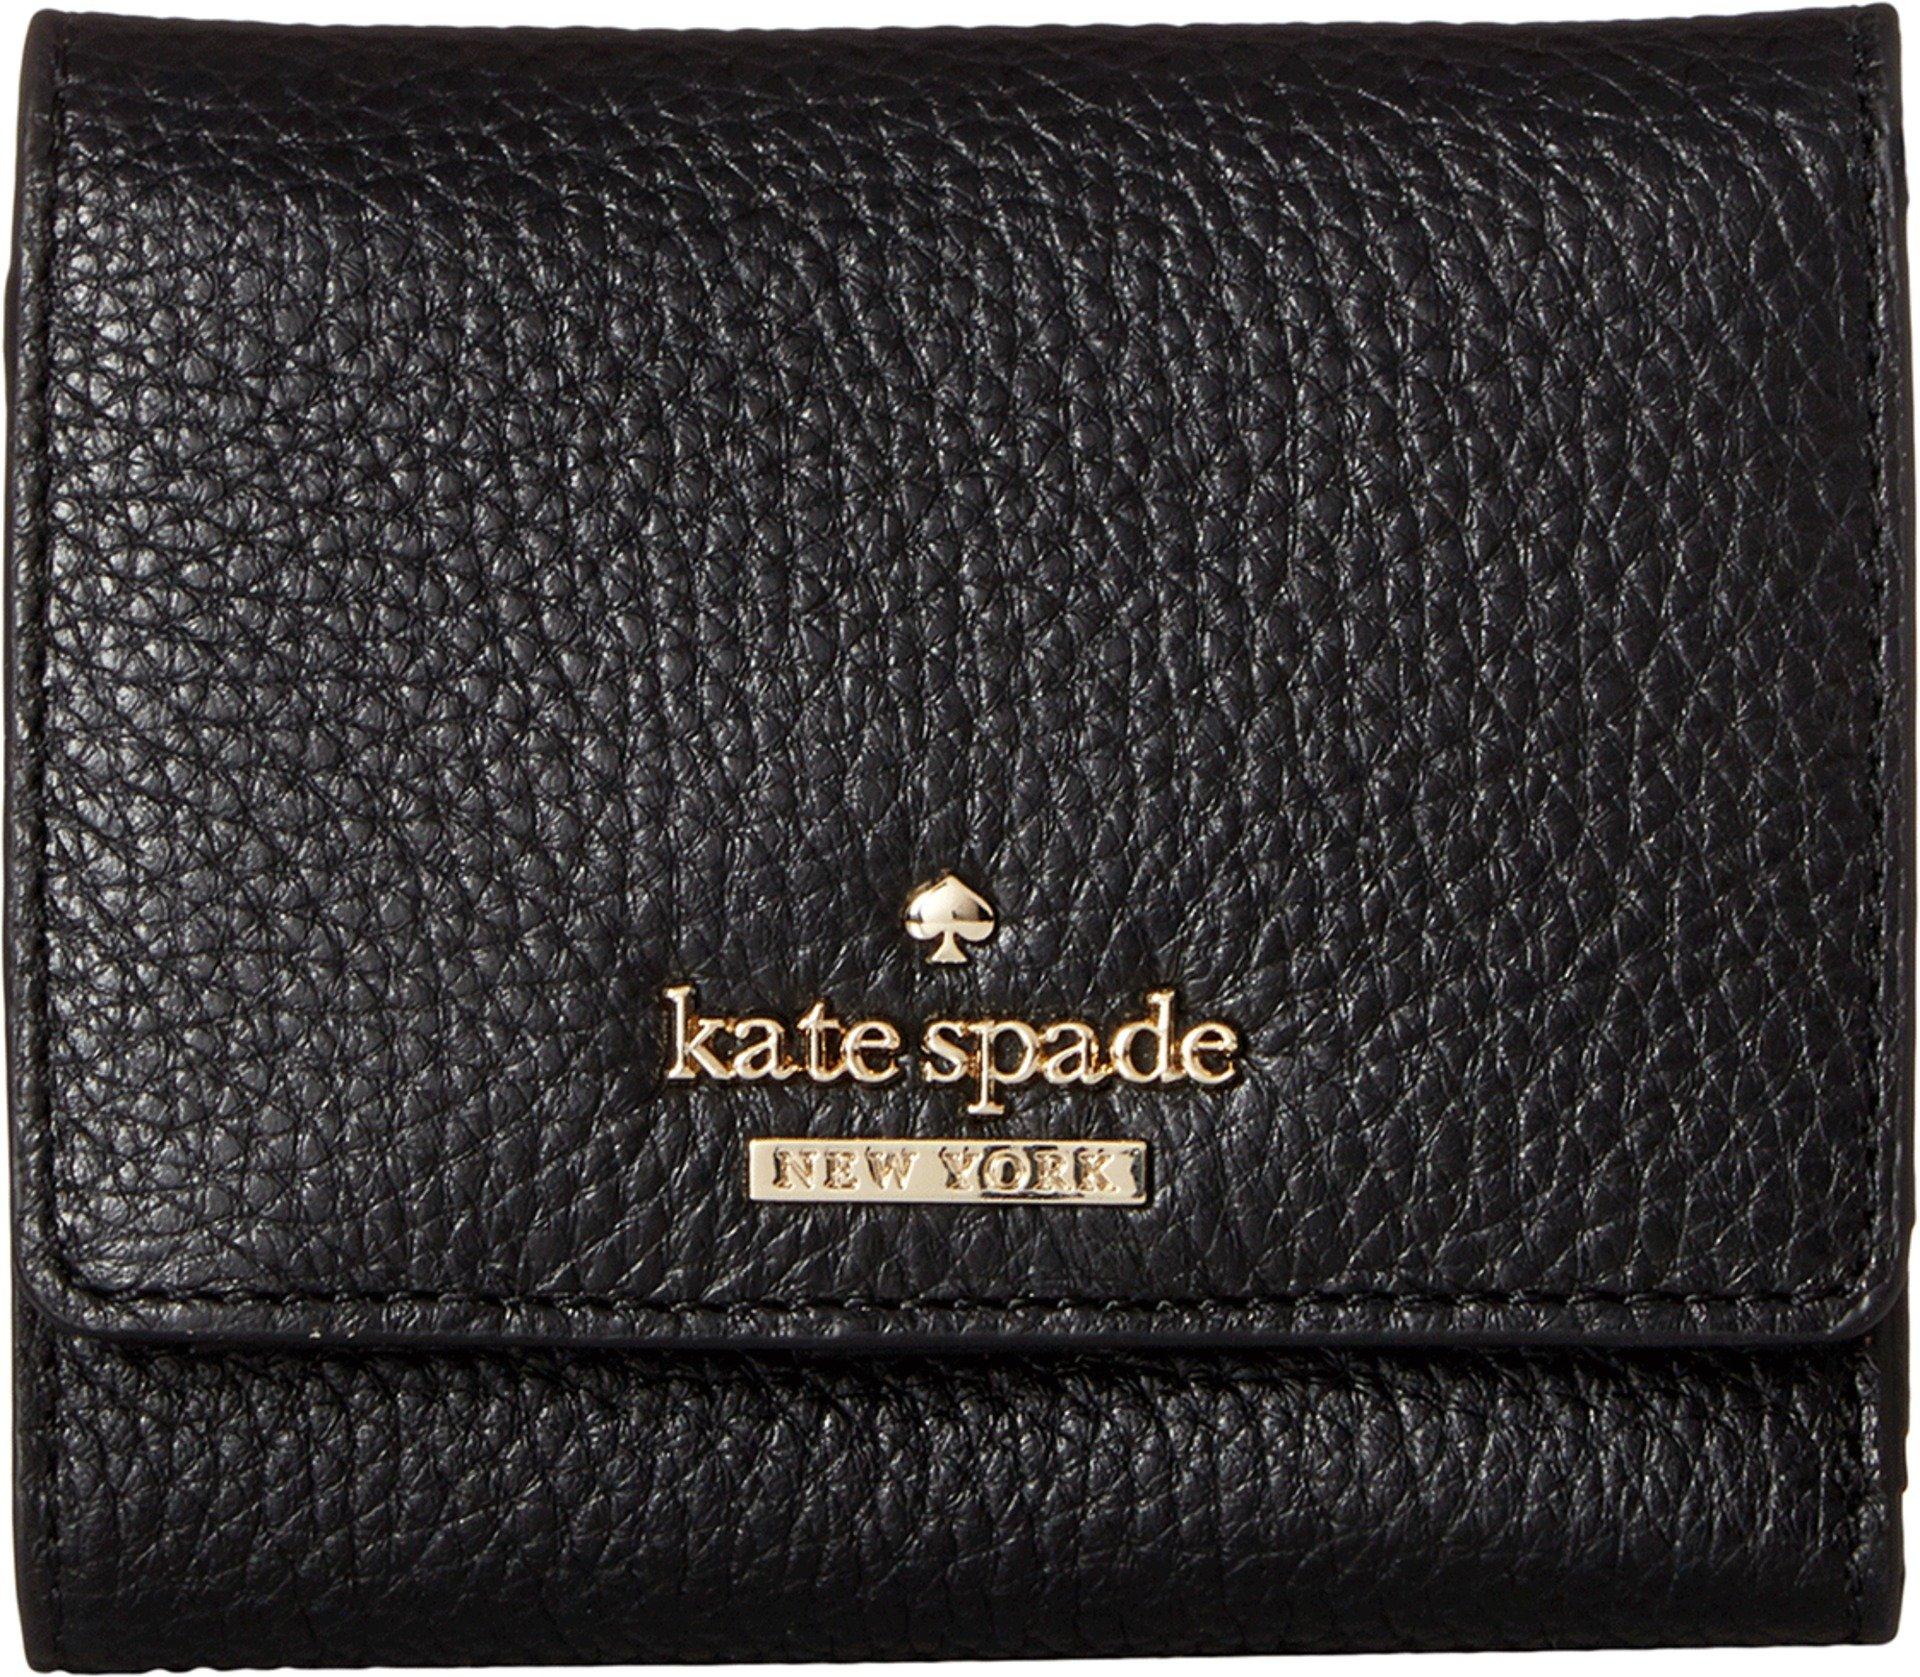 Kate Spade New York Women's Jackson Street Jada Wallet, Black, One Size by Kate Spade New York